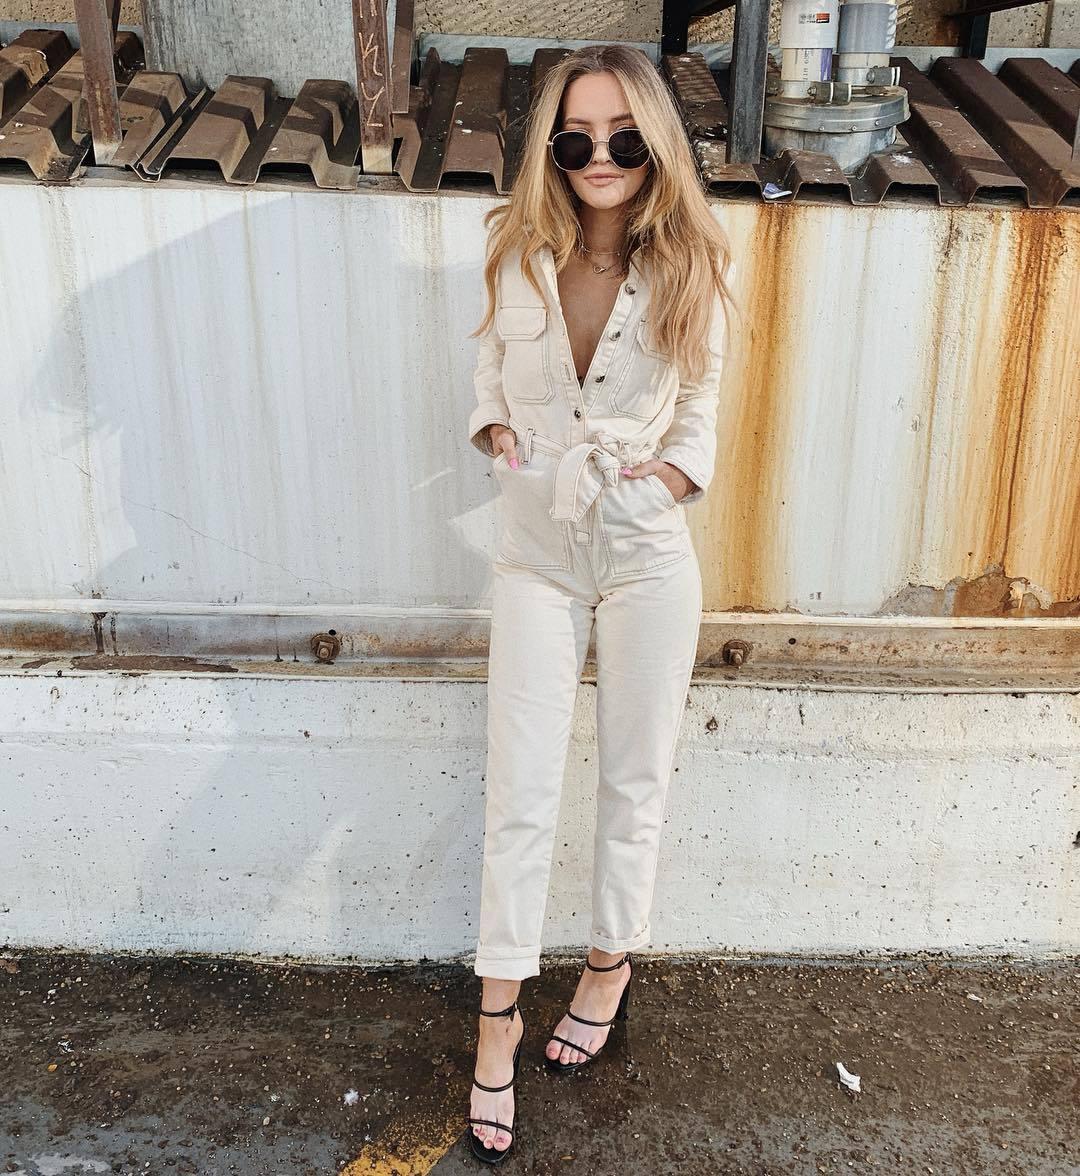 jumpsuit long sleeves topshop black sandals sunglasses